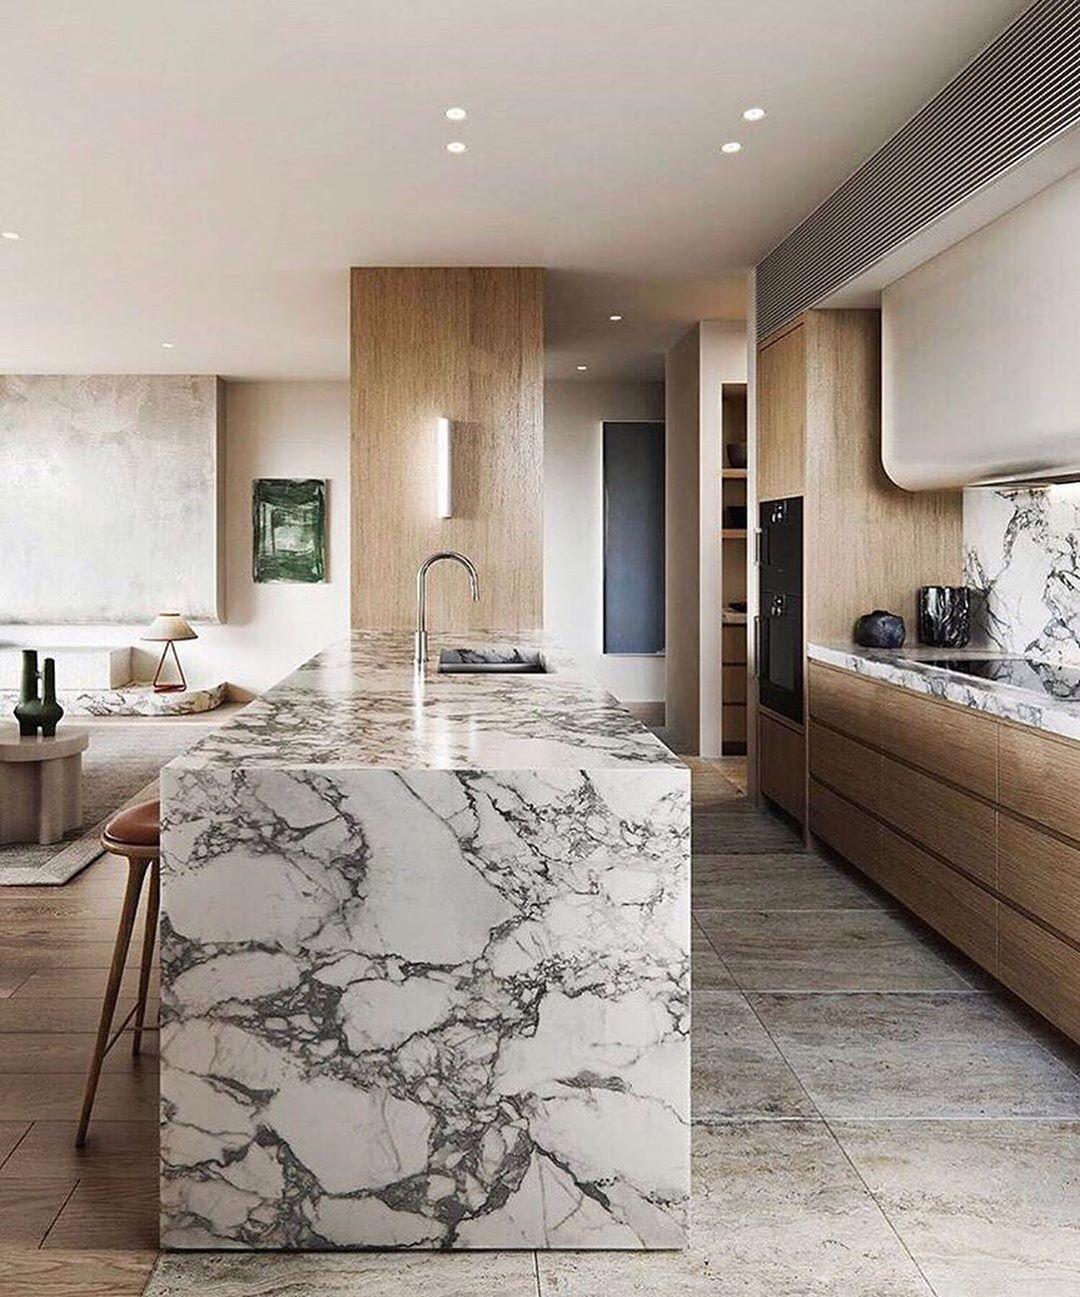 Luxury Interior By Aither On Instagram Marble Design Goals Do